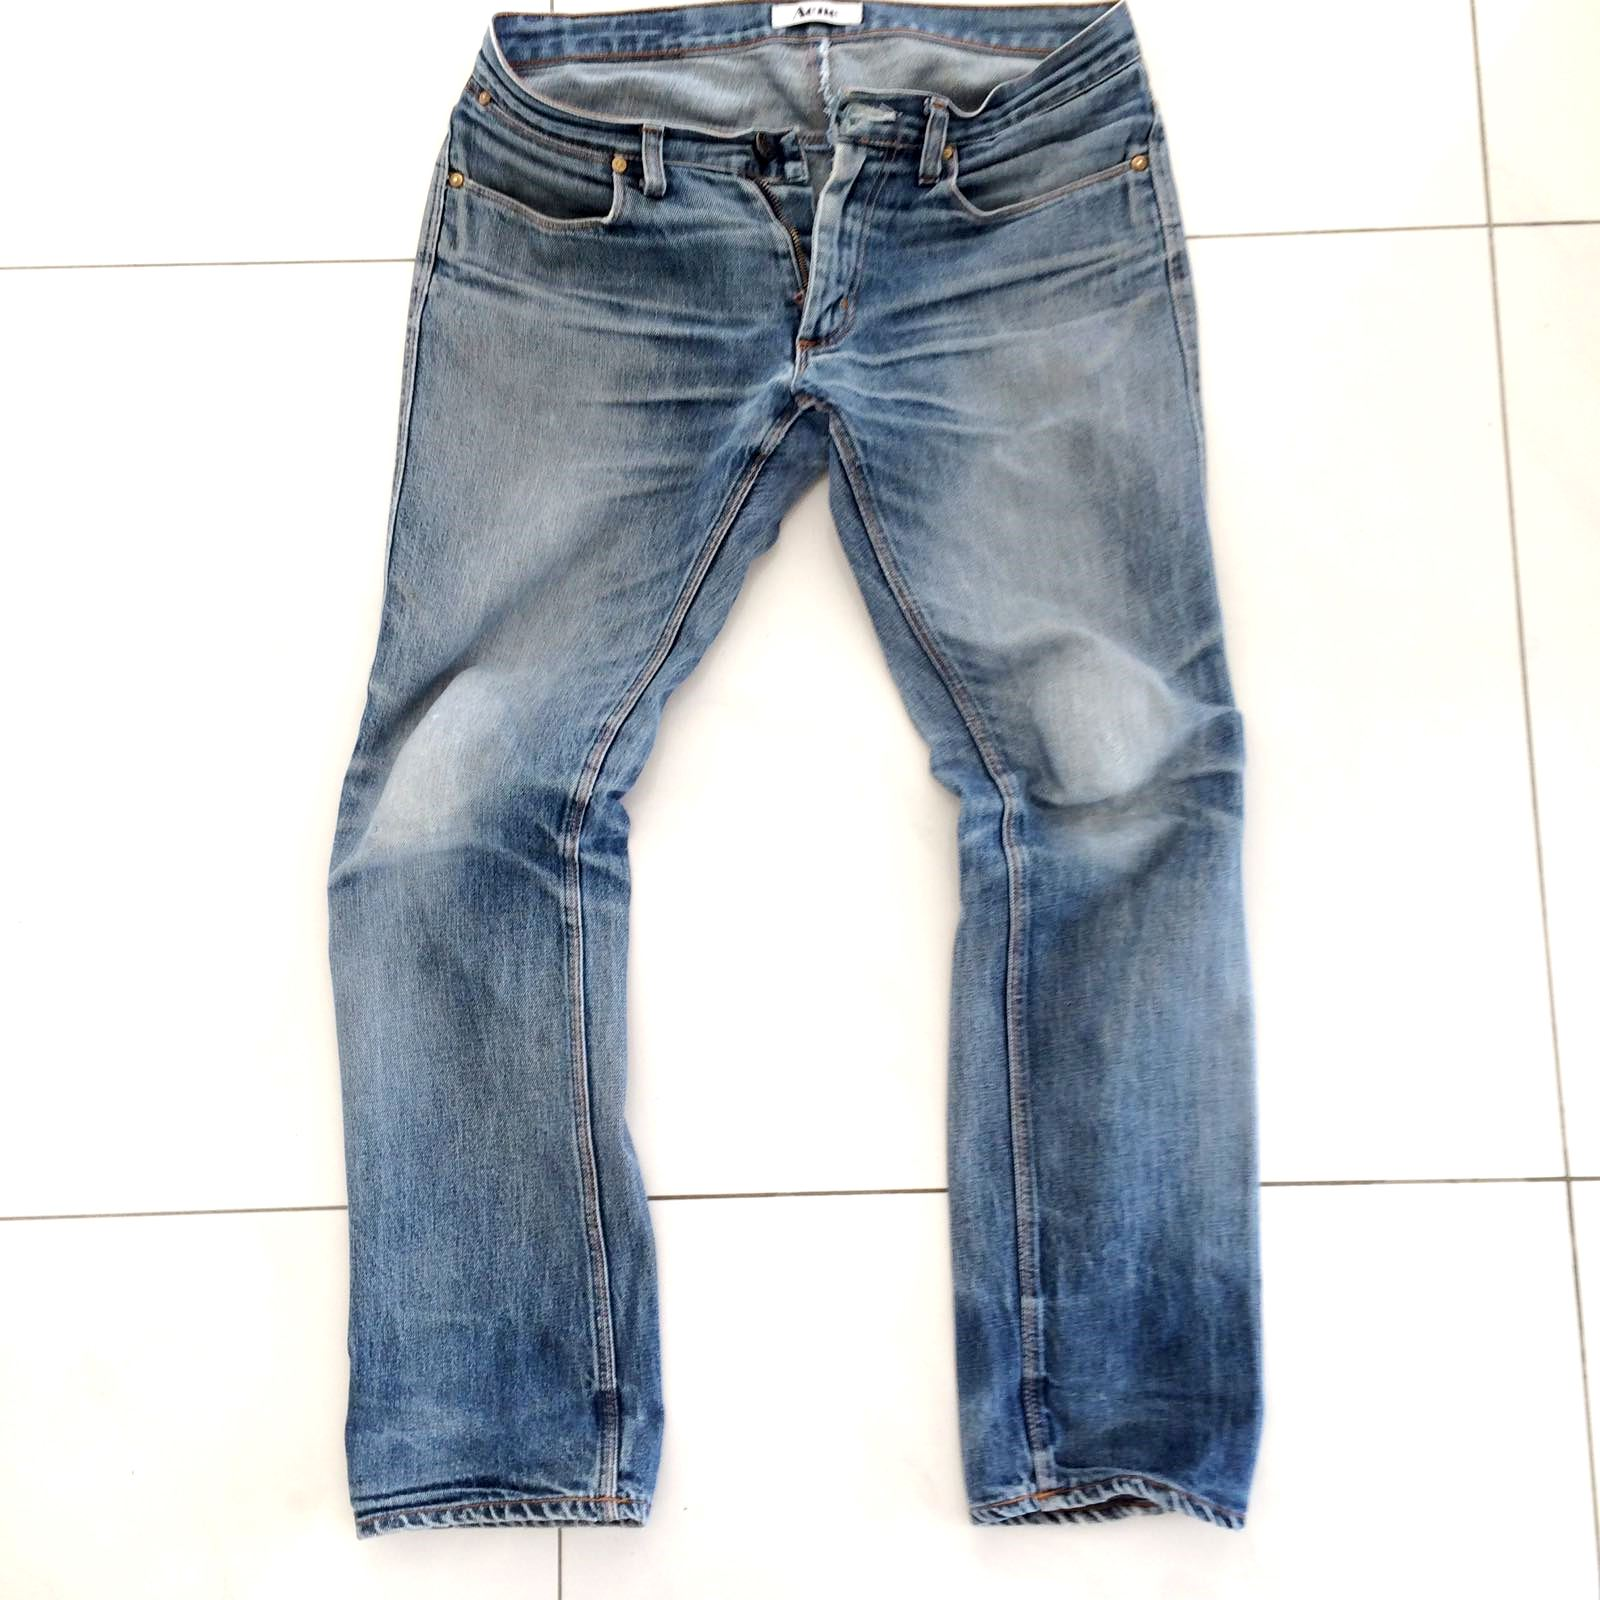 kees-kreuter-long-john-blog-jeans-denim-acne-worn-out-worn-aged-ageing-old-indigo-1